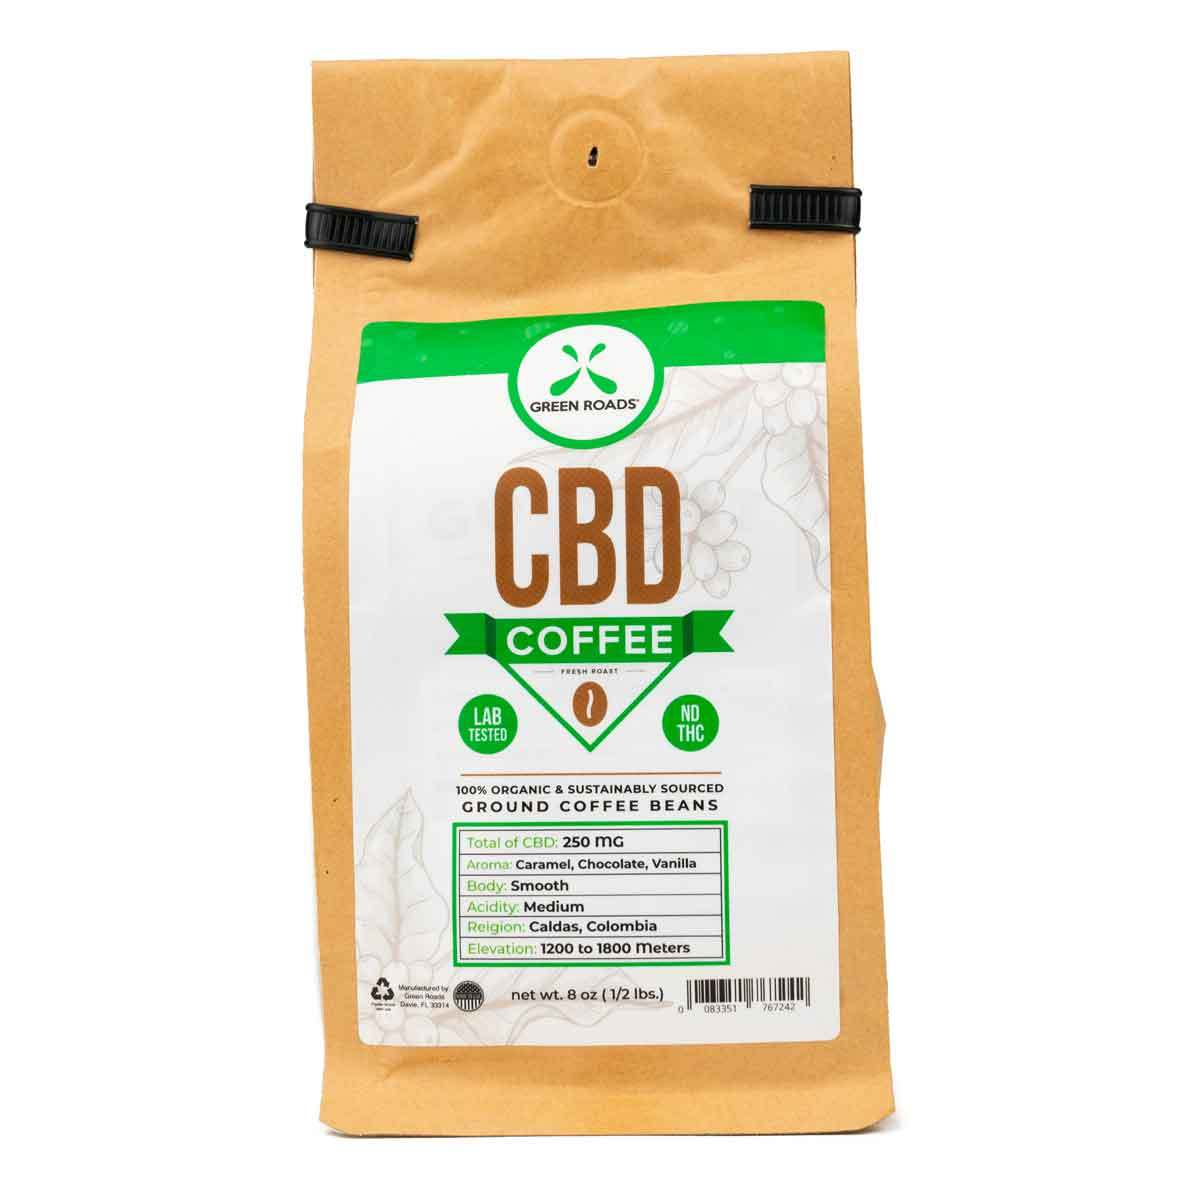 Green Roads Cbd Coffee 8oz